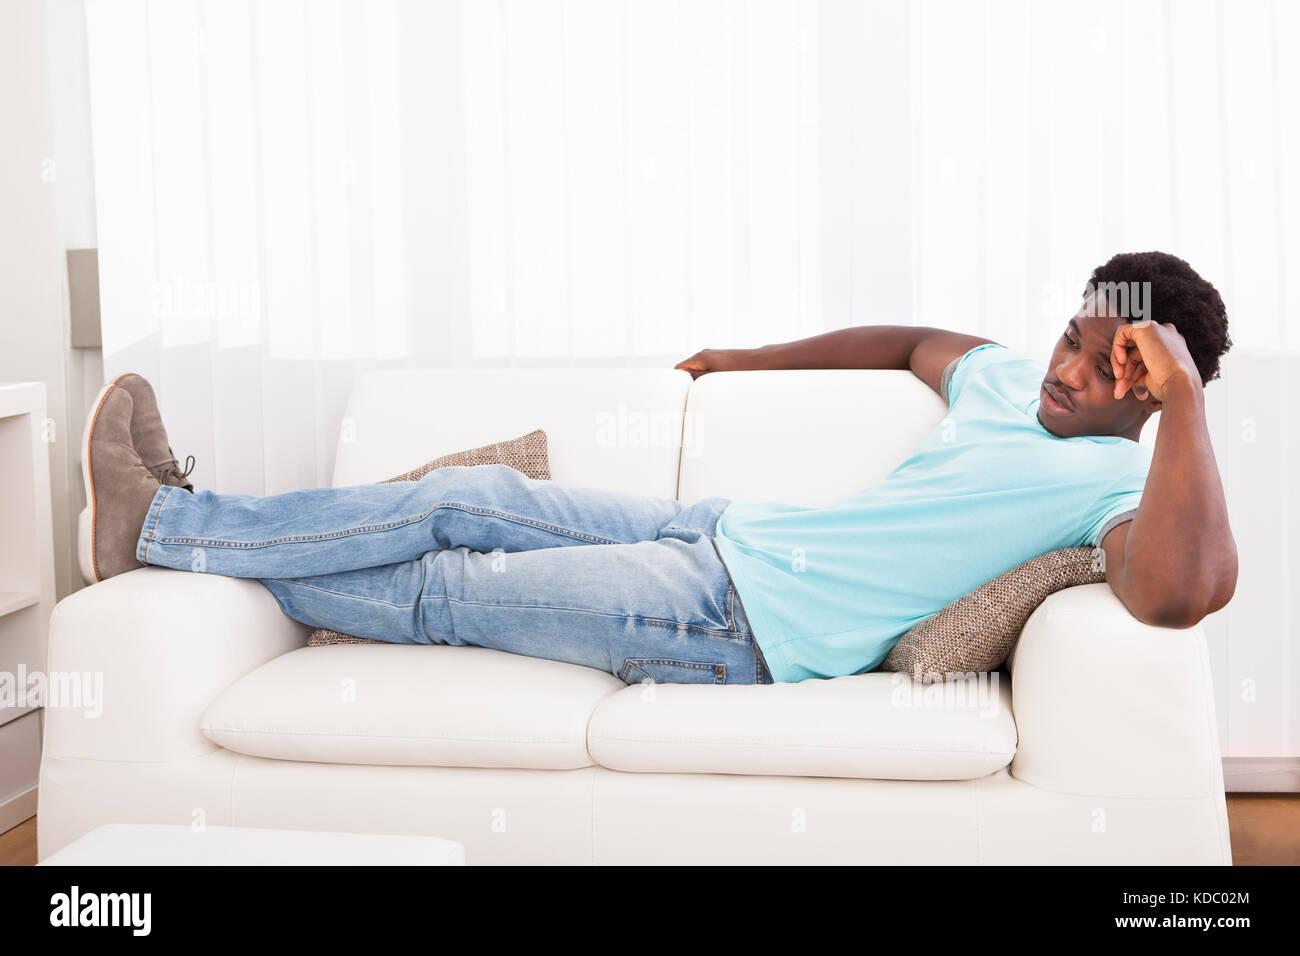 lazy man stock photos lazy man stock images alamy. Black Bedroom Furniture Sets. Home Design Ideas